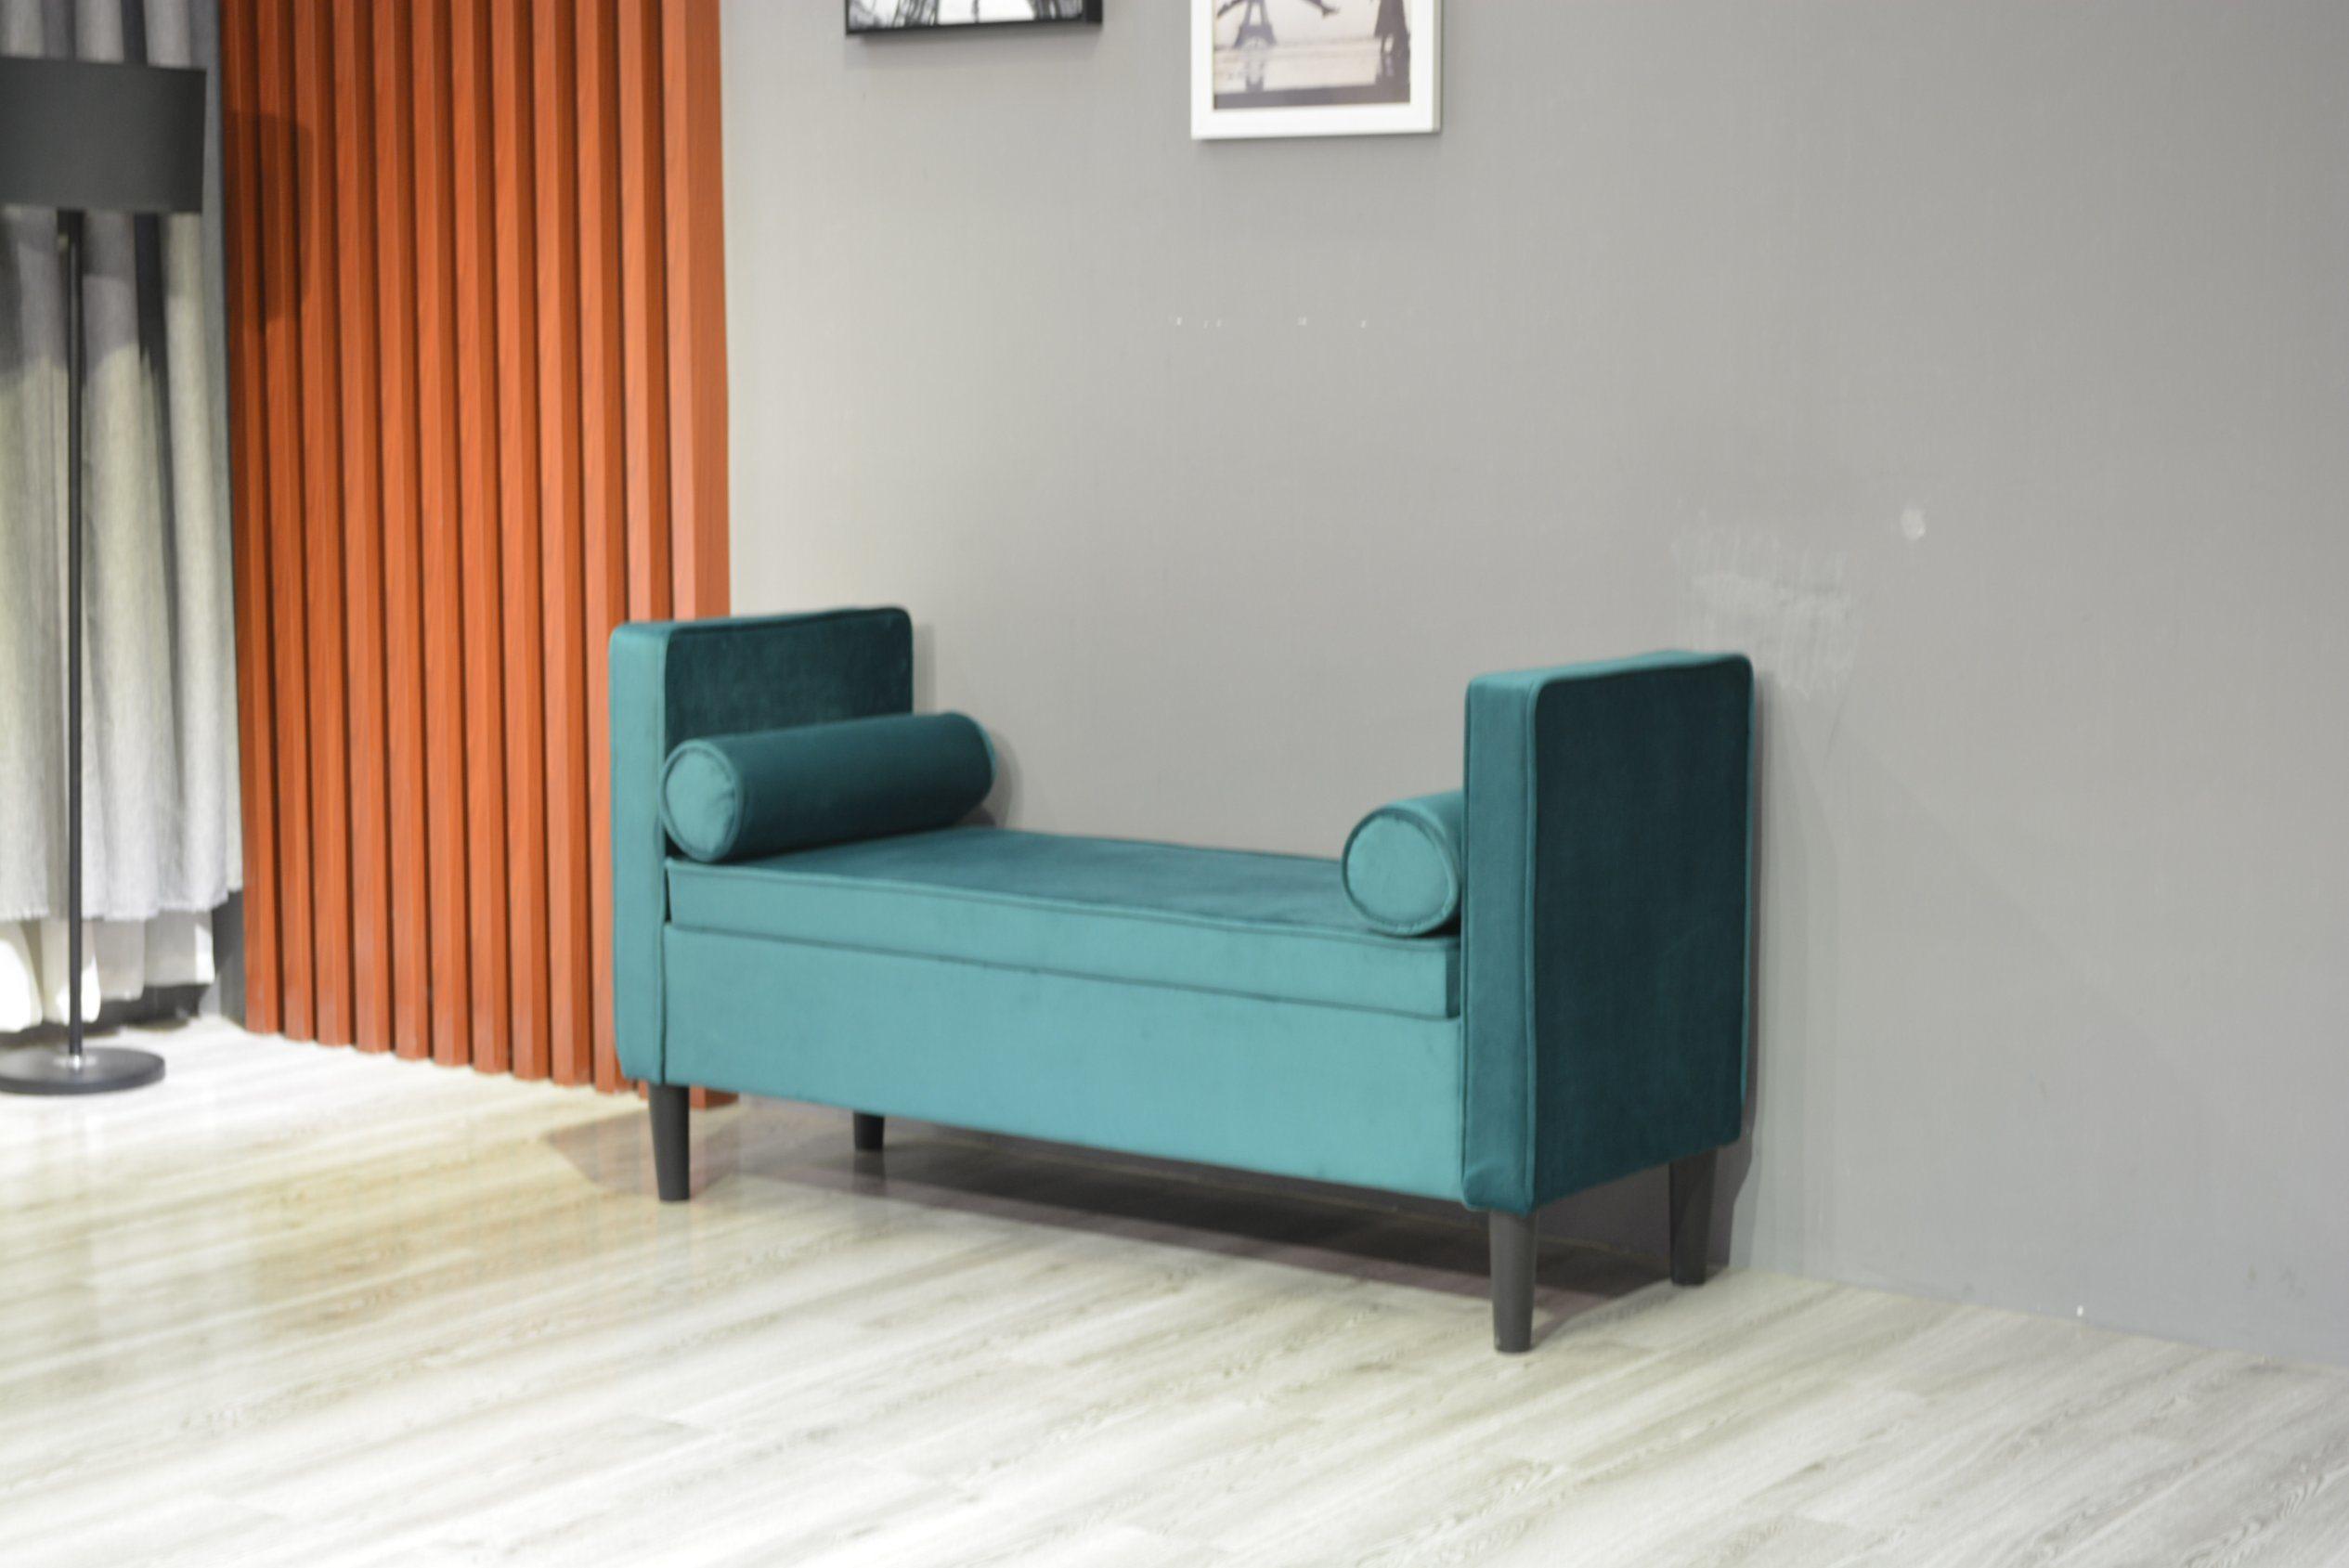 anhui huayang furniture co ltd